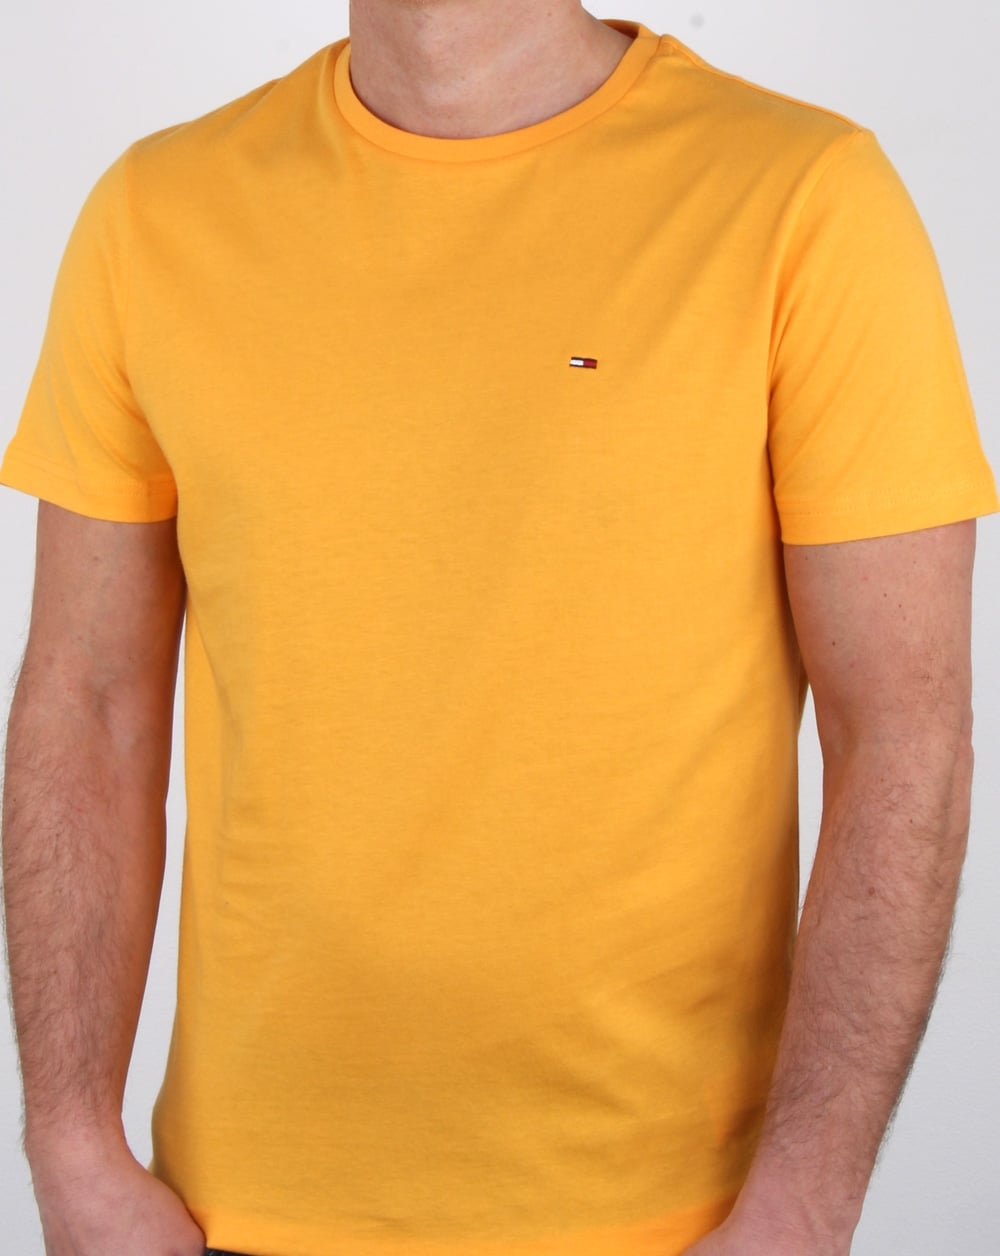 c41bb658 Tommy Hilfiger Jeans Tommy Hilfiger Cotton Crew Neck T Shirt Yellow